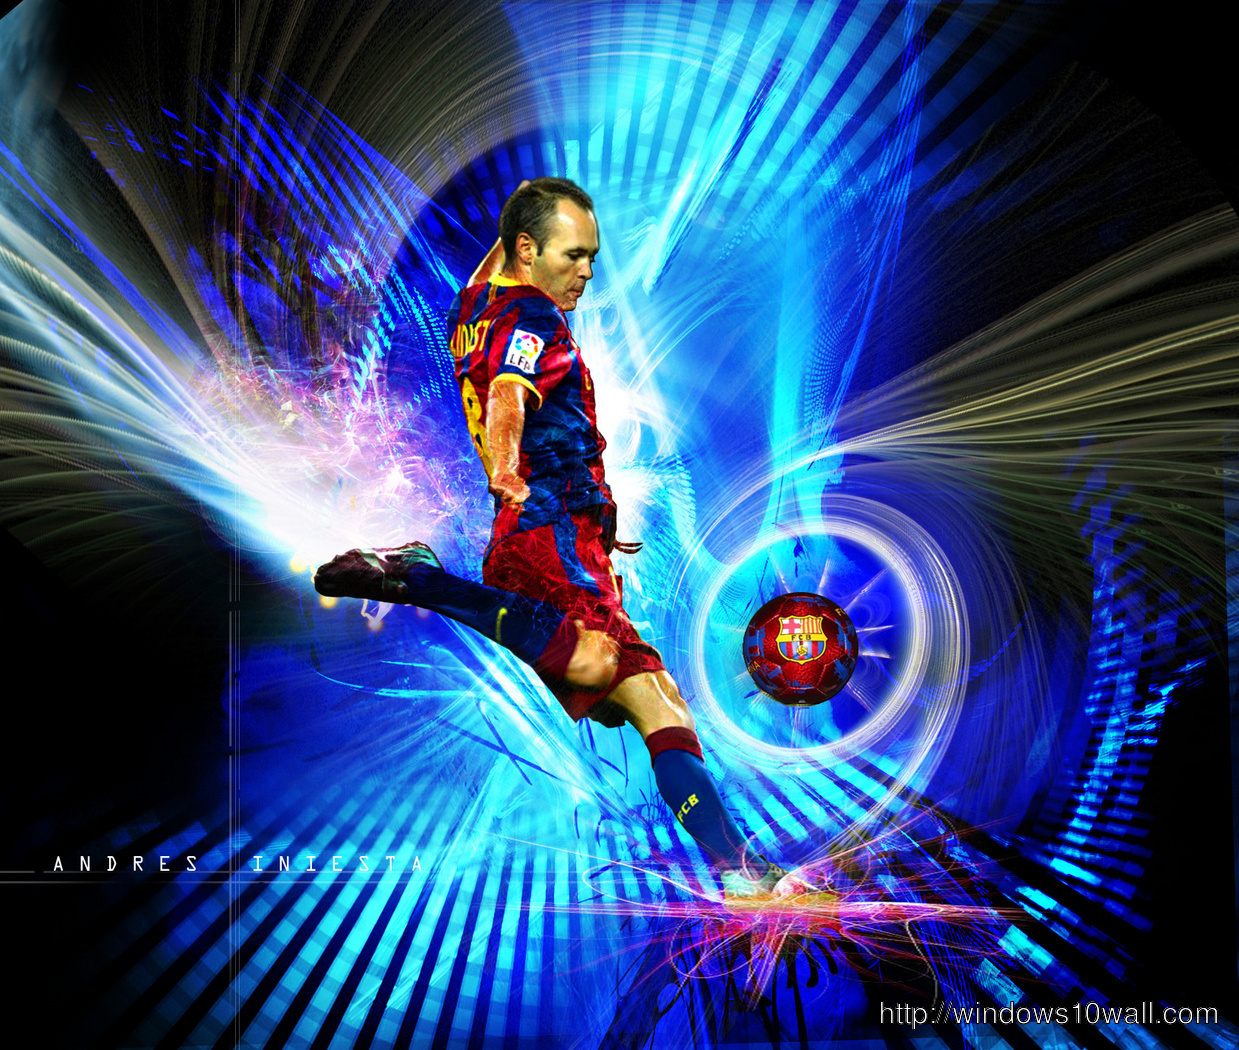 Andr S Iniesta FC Barcelona Andres Iniesta Lujan Hd Background Wallpaper